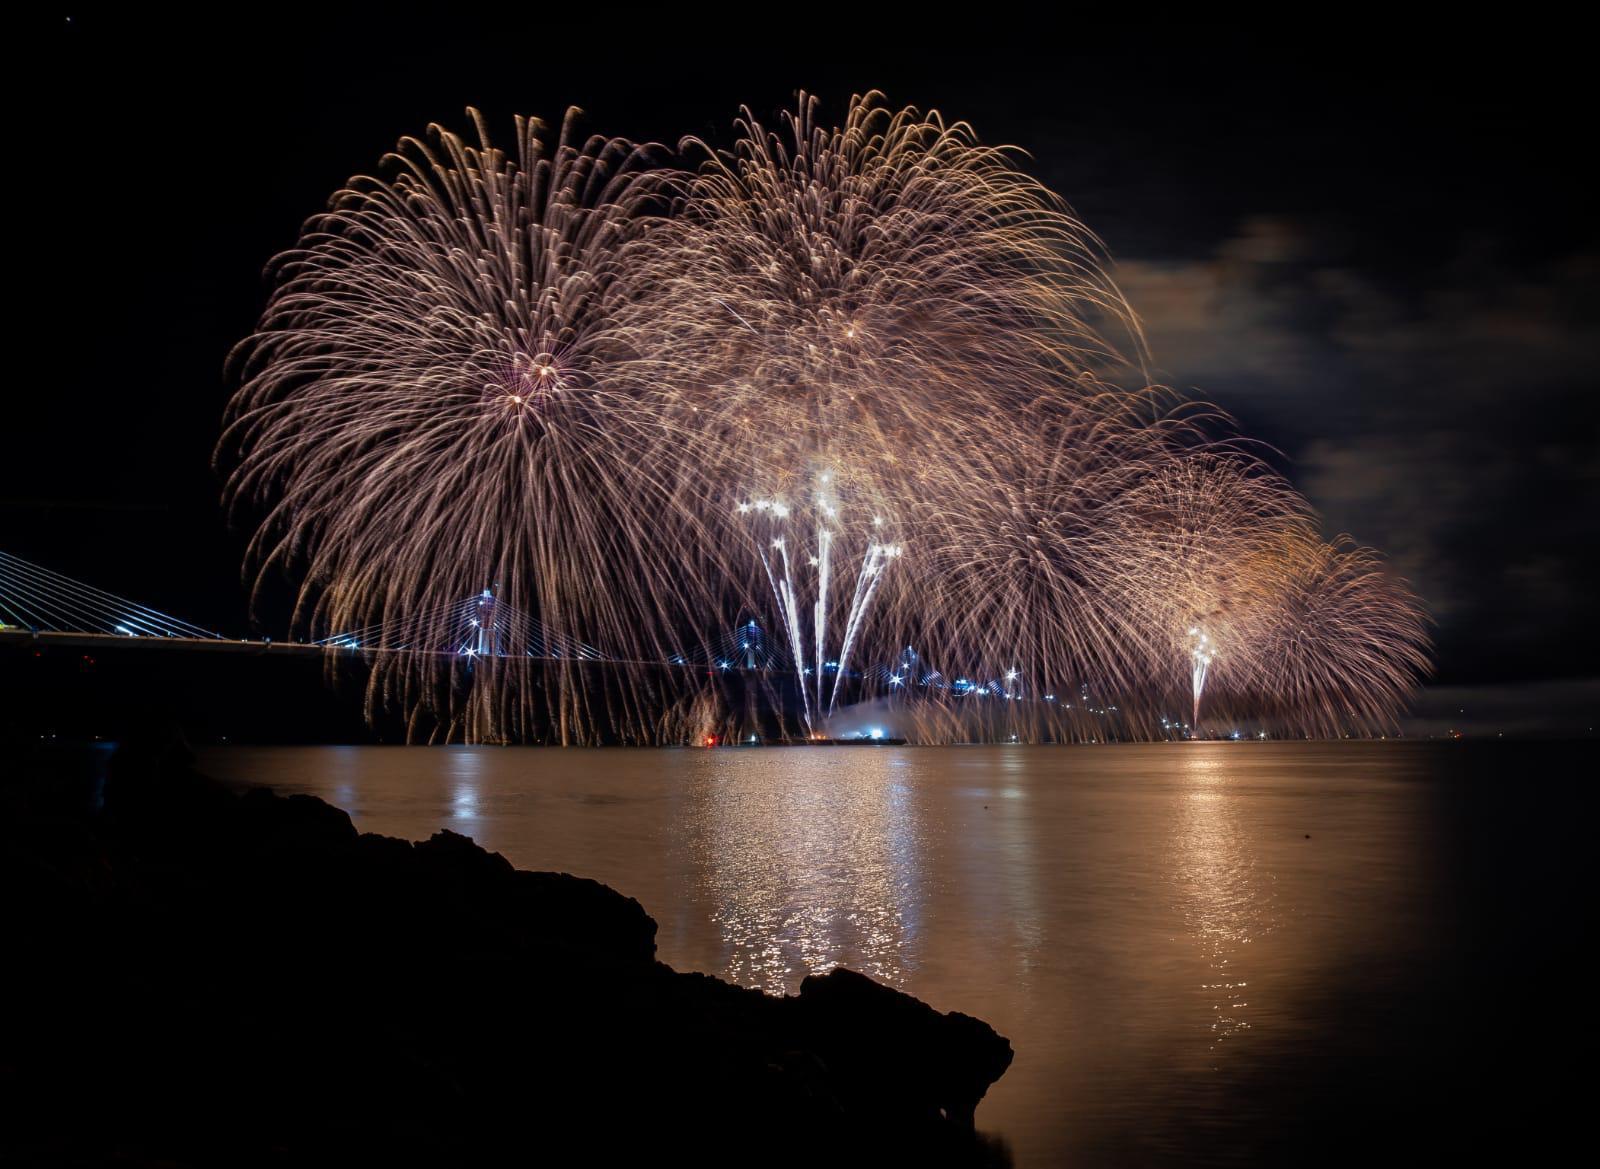 The story behind the fireworks display celebrating Pelješac bridge connection-5